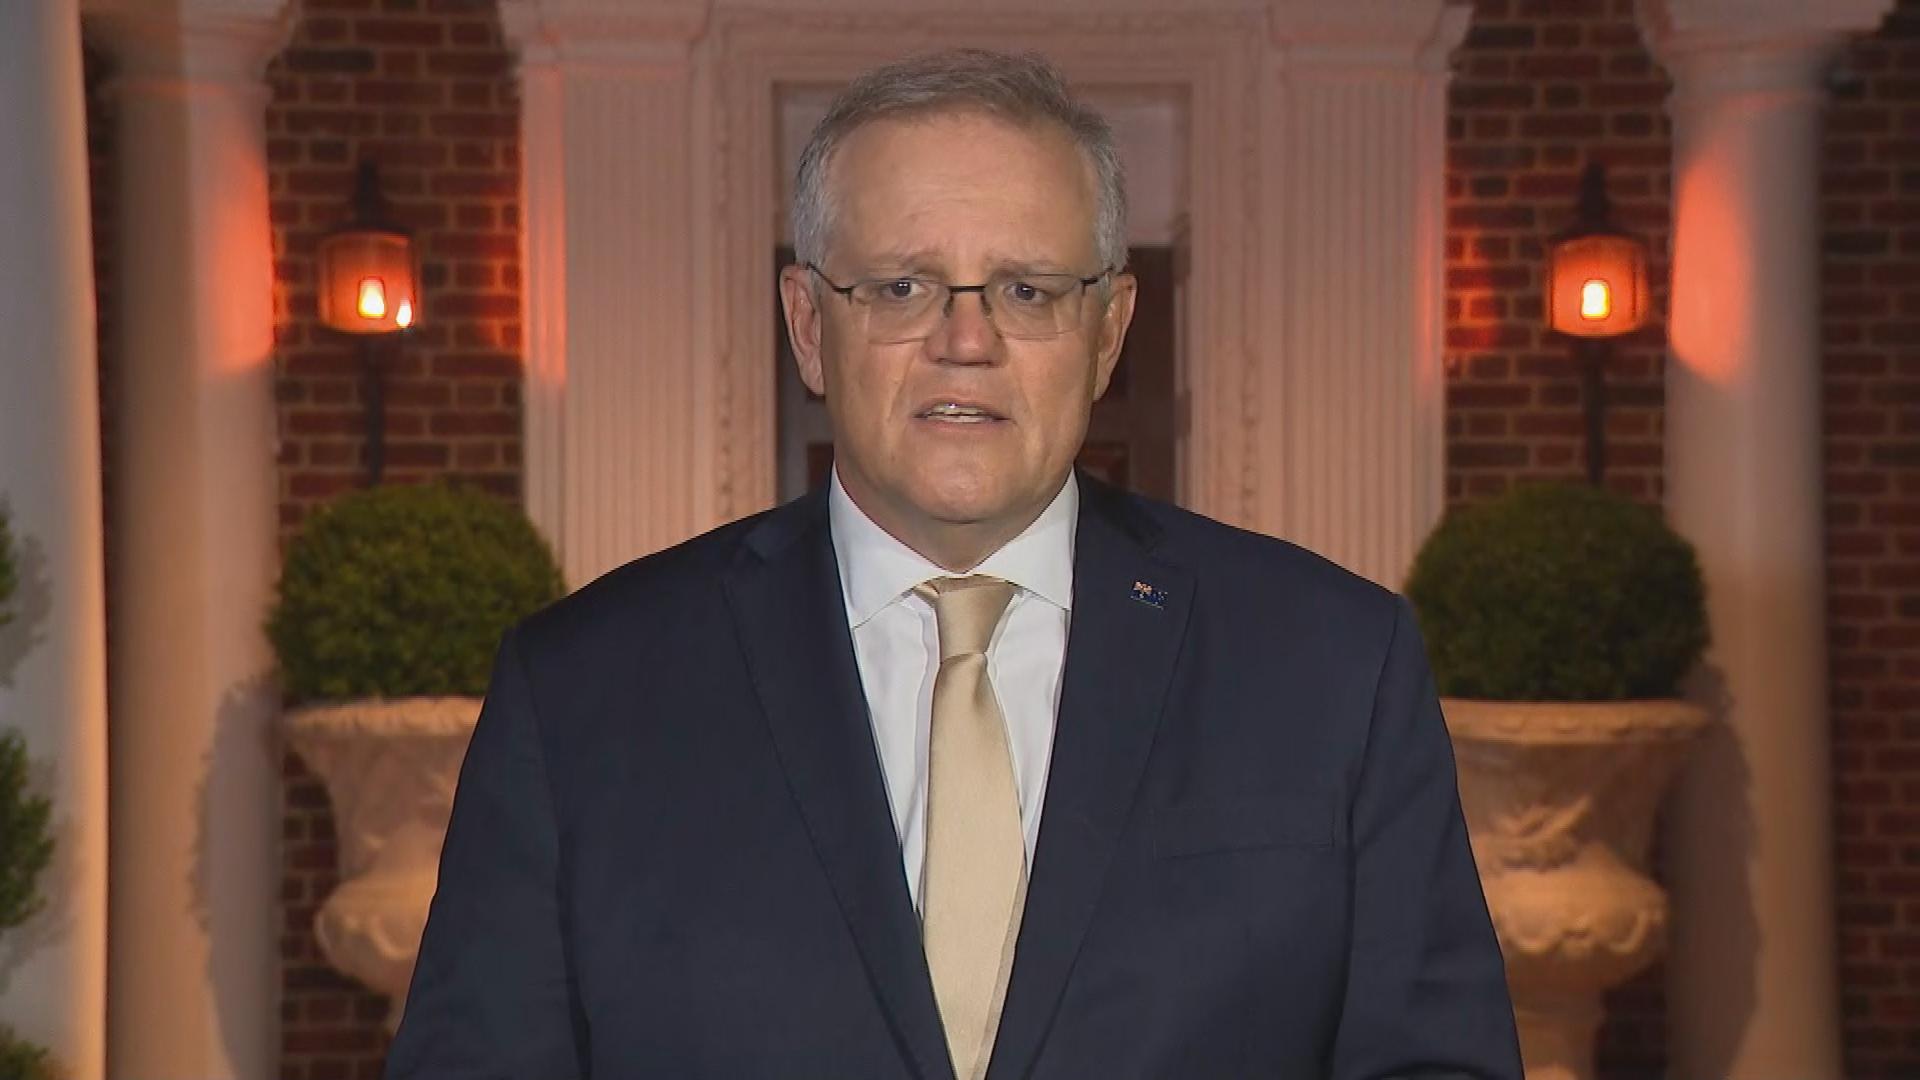 PM speaks on 'rare' Victoria earthquake